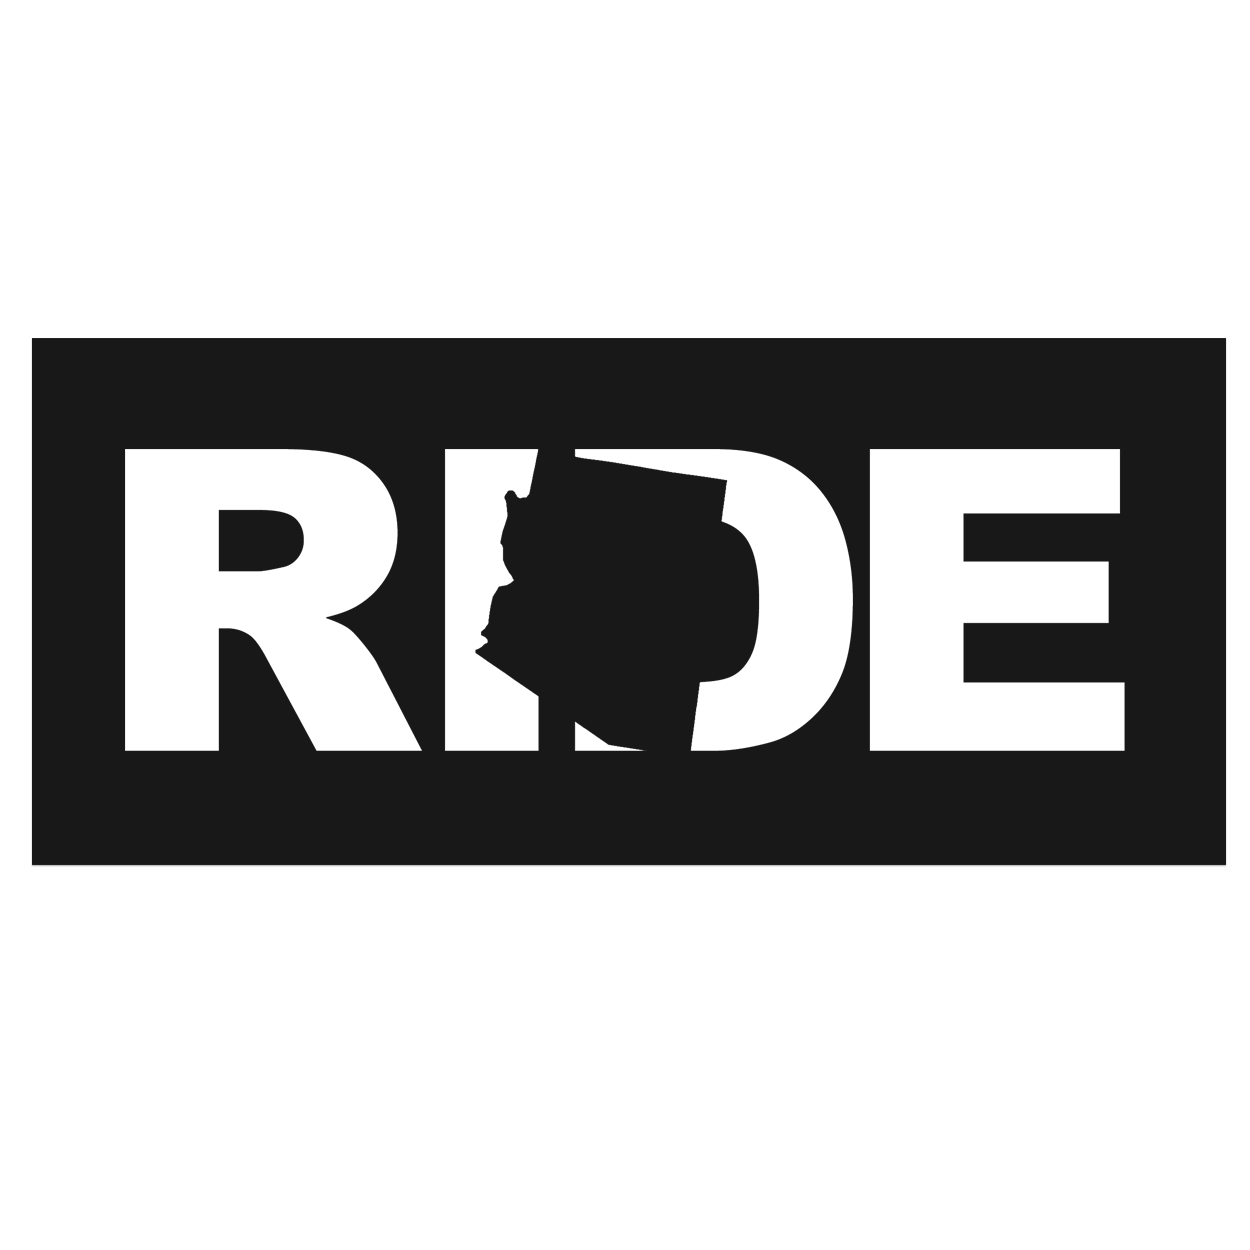 Ride Arizona Classic Hardboard Sign (White Logo)